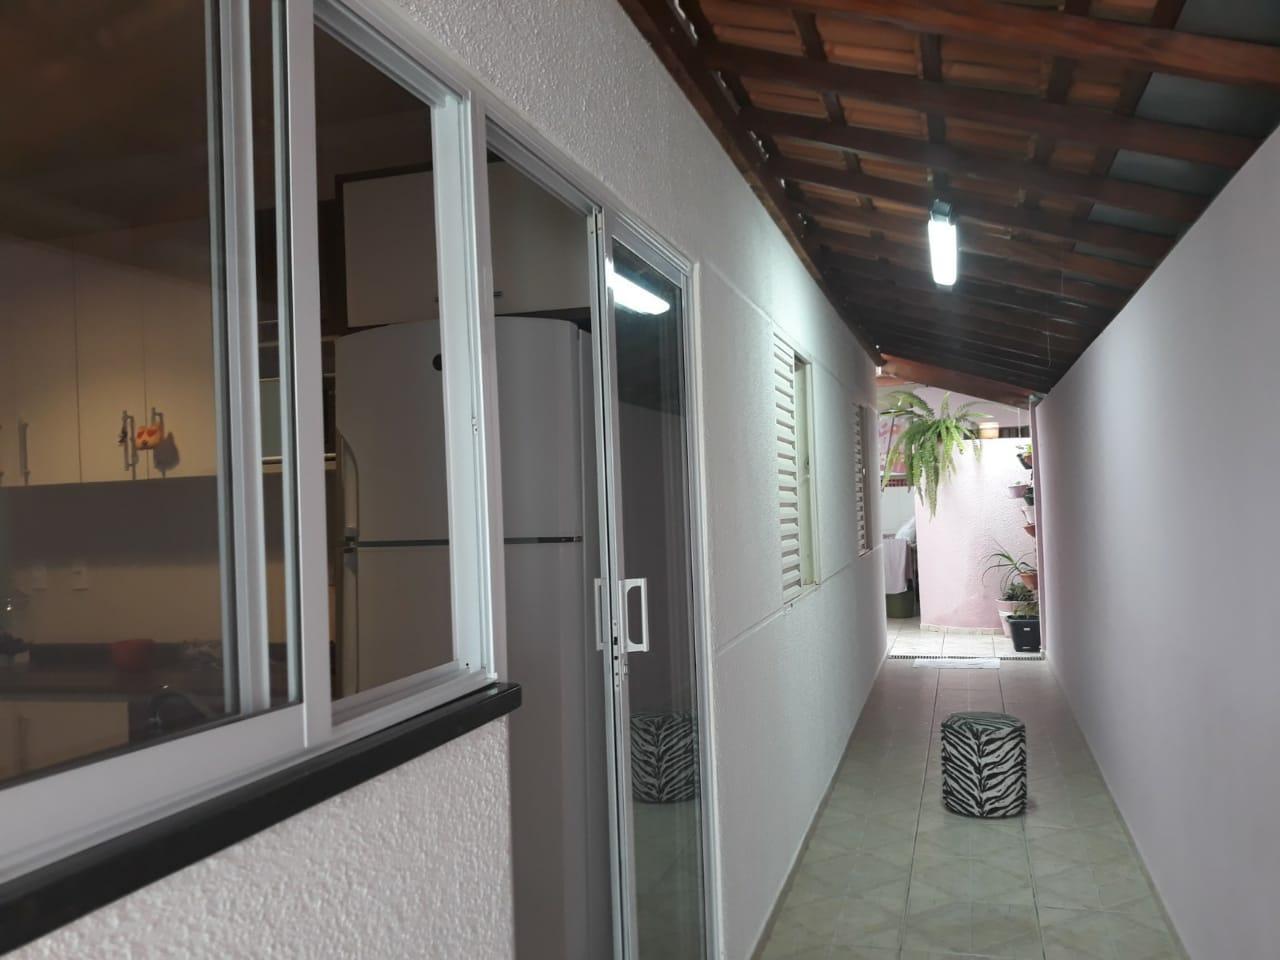 Casa com 2 dormitórios à venda, 70 m² por R$ 318.000 - Jardim Villagio Ghiraldelli - Hortolândia/SP